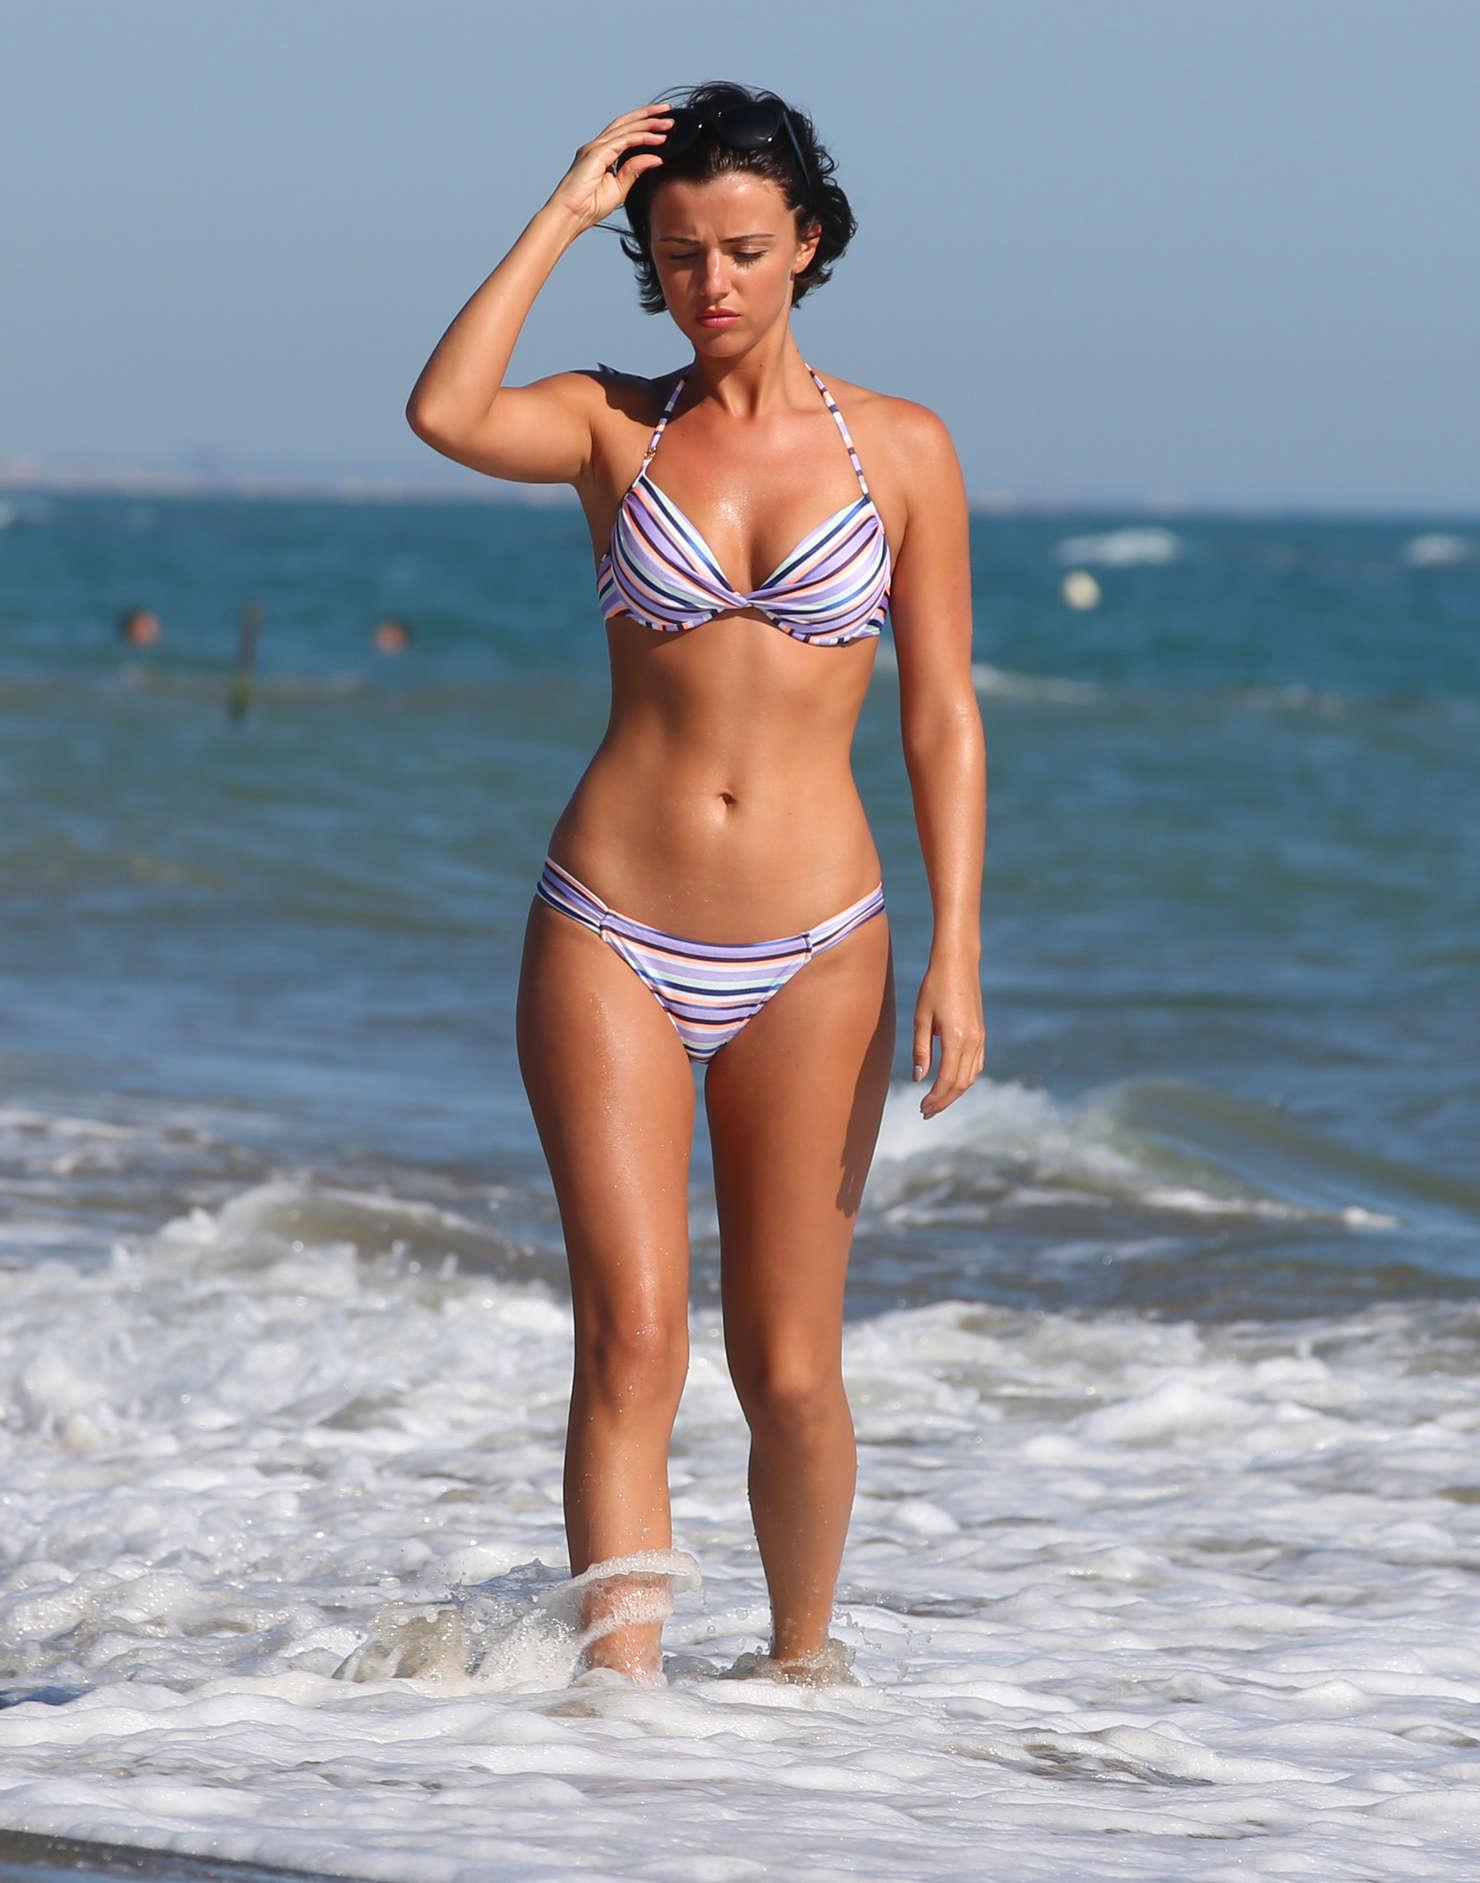 lucy mecklenburgh wearing bikini in italy   gotceleb